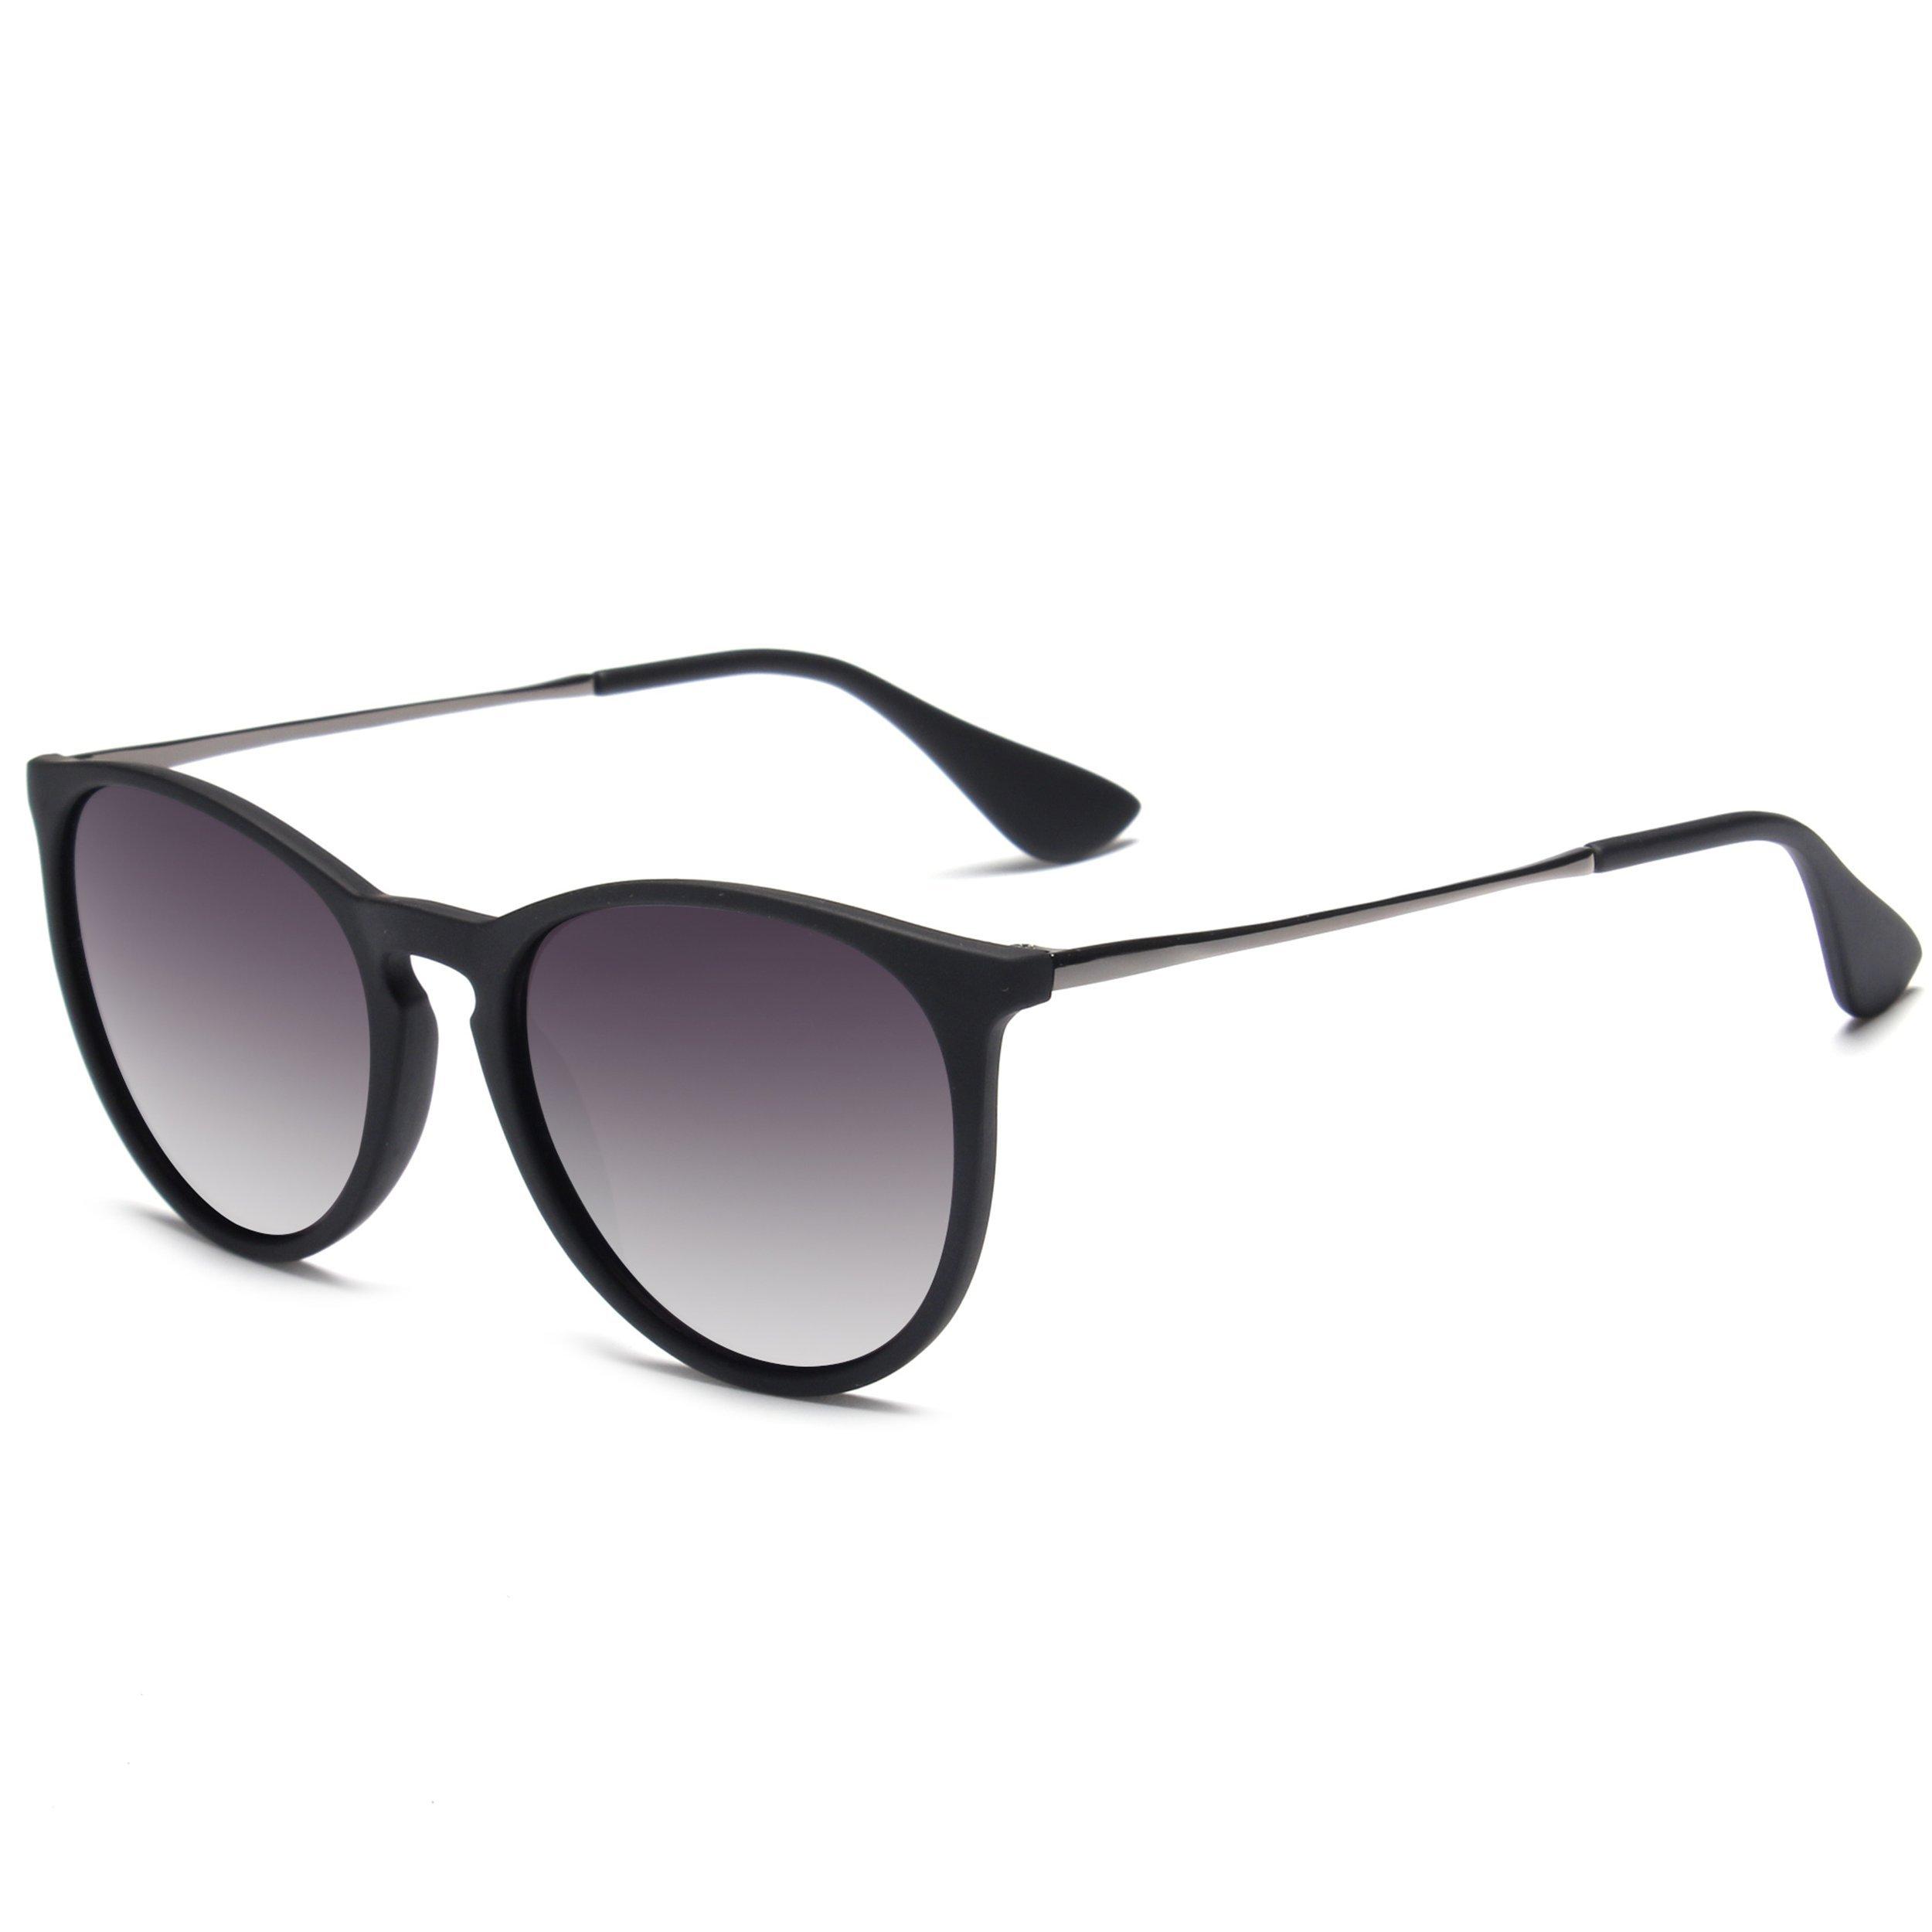 SUNGAIT Vintage Round Sunglasses for Women Classic Retro Designer Style (Black Frame Matte Finish/Grey Gradient Lens)